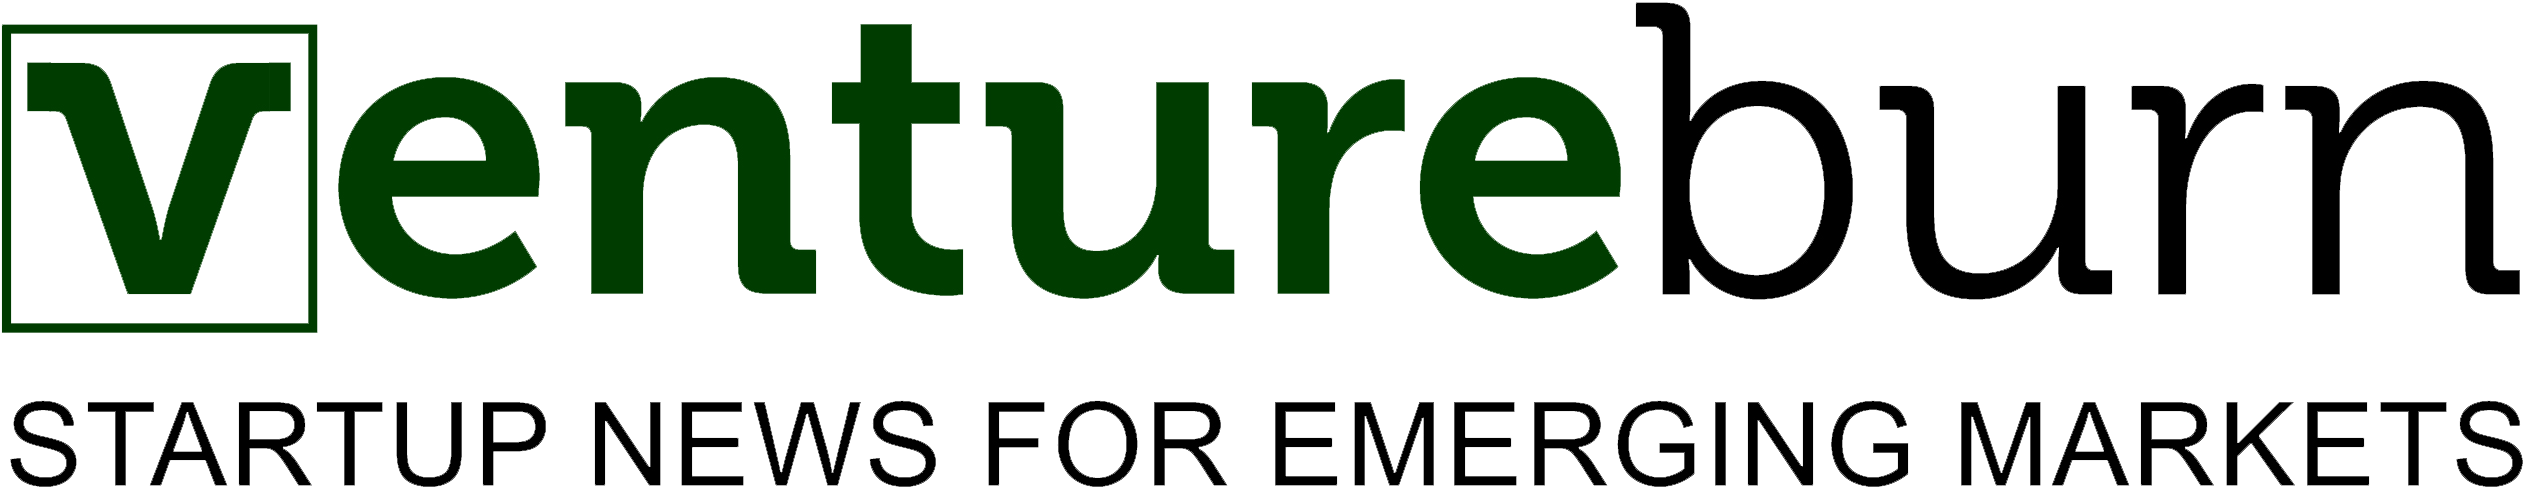 Ventureburn logo